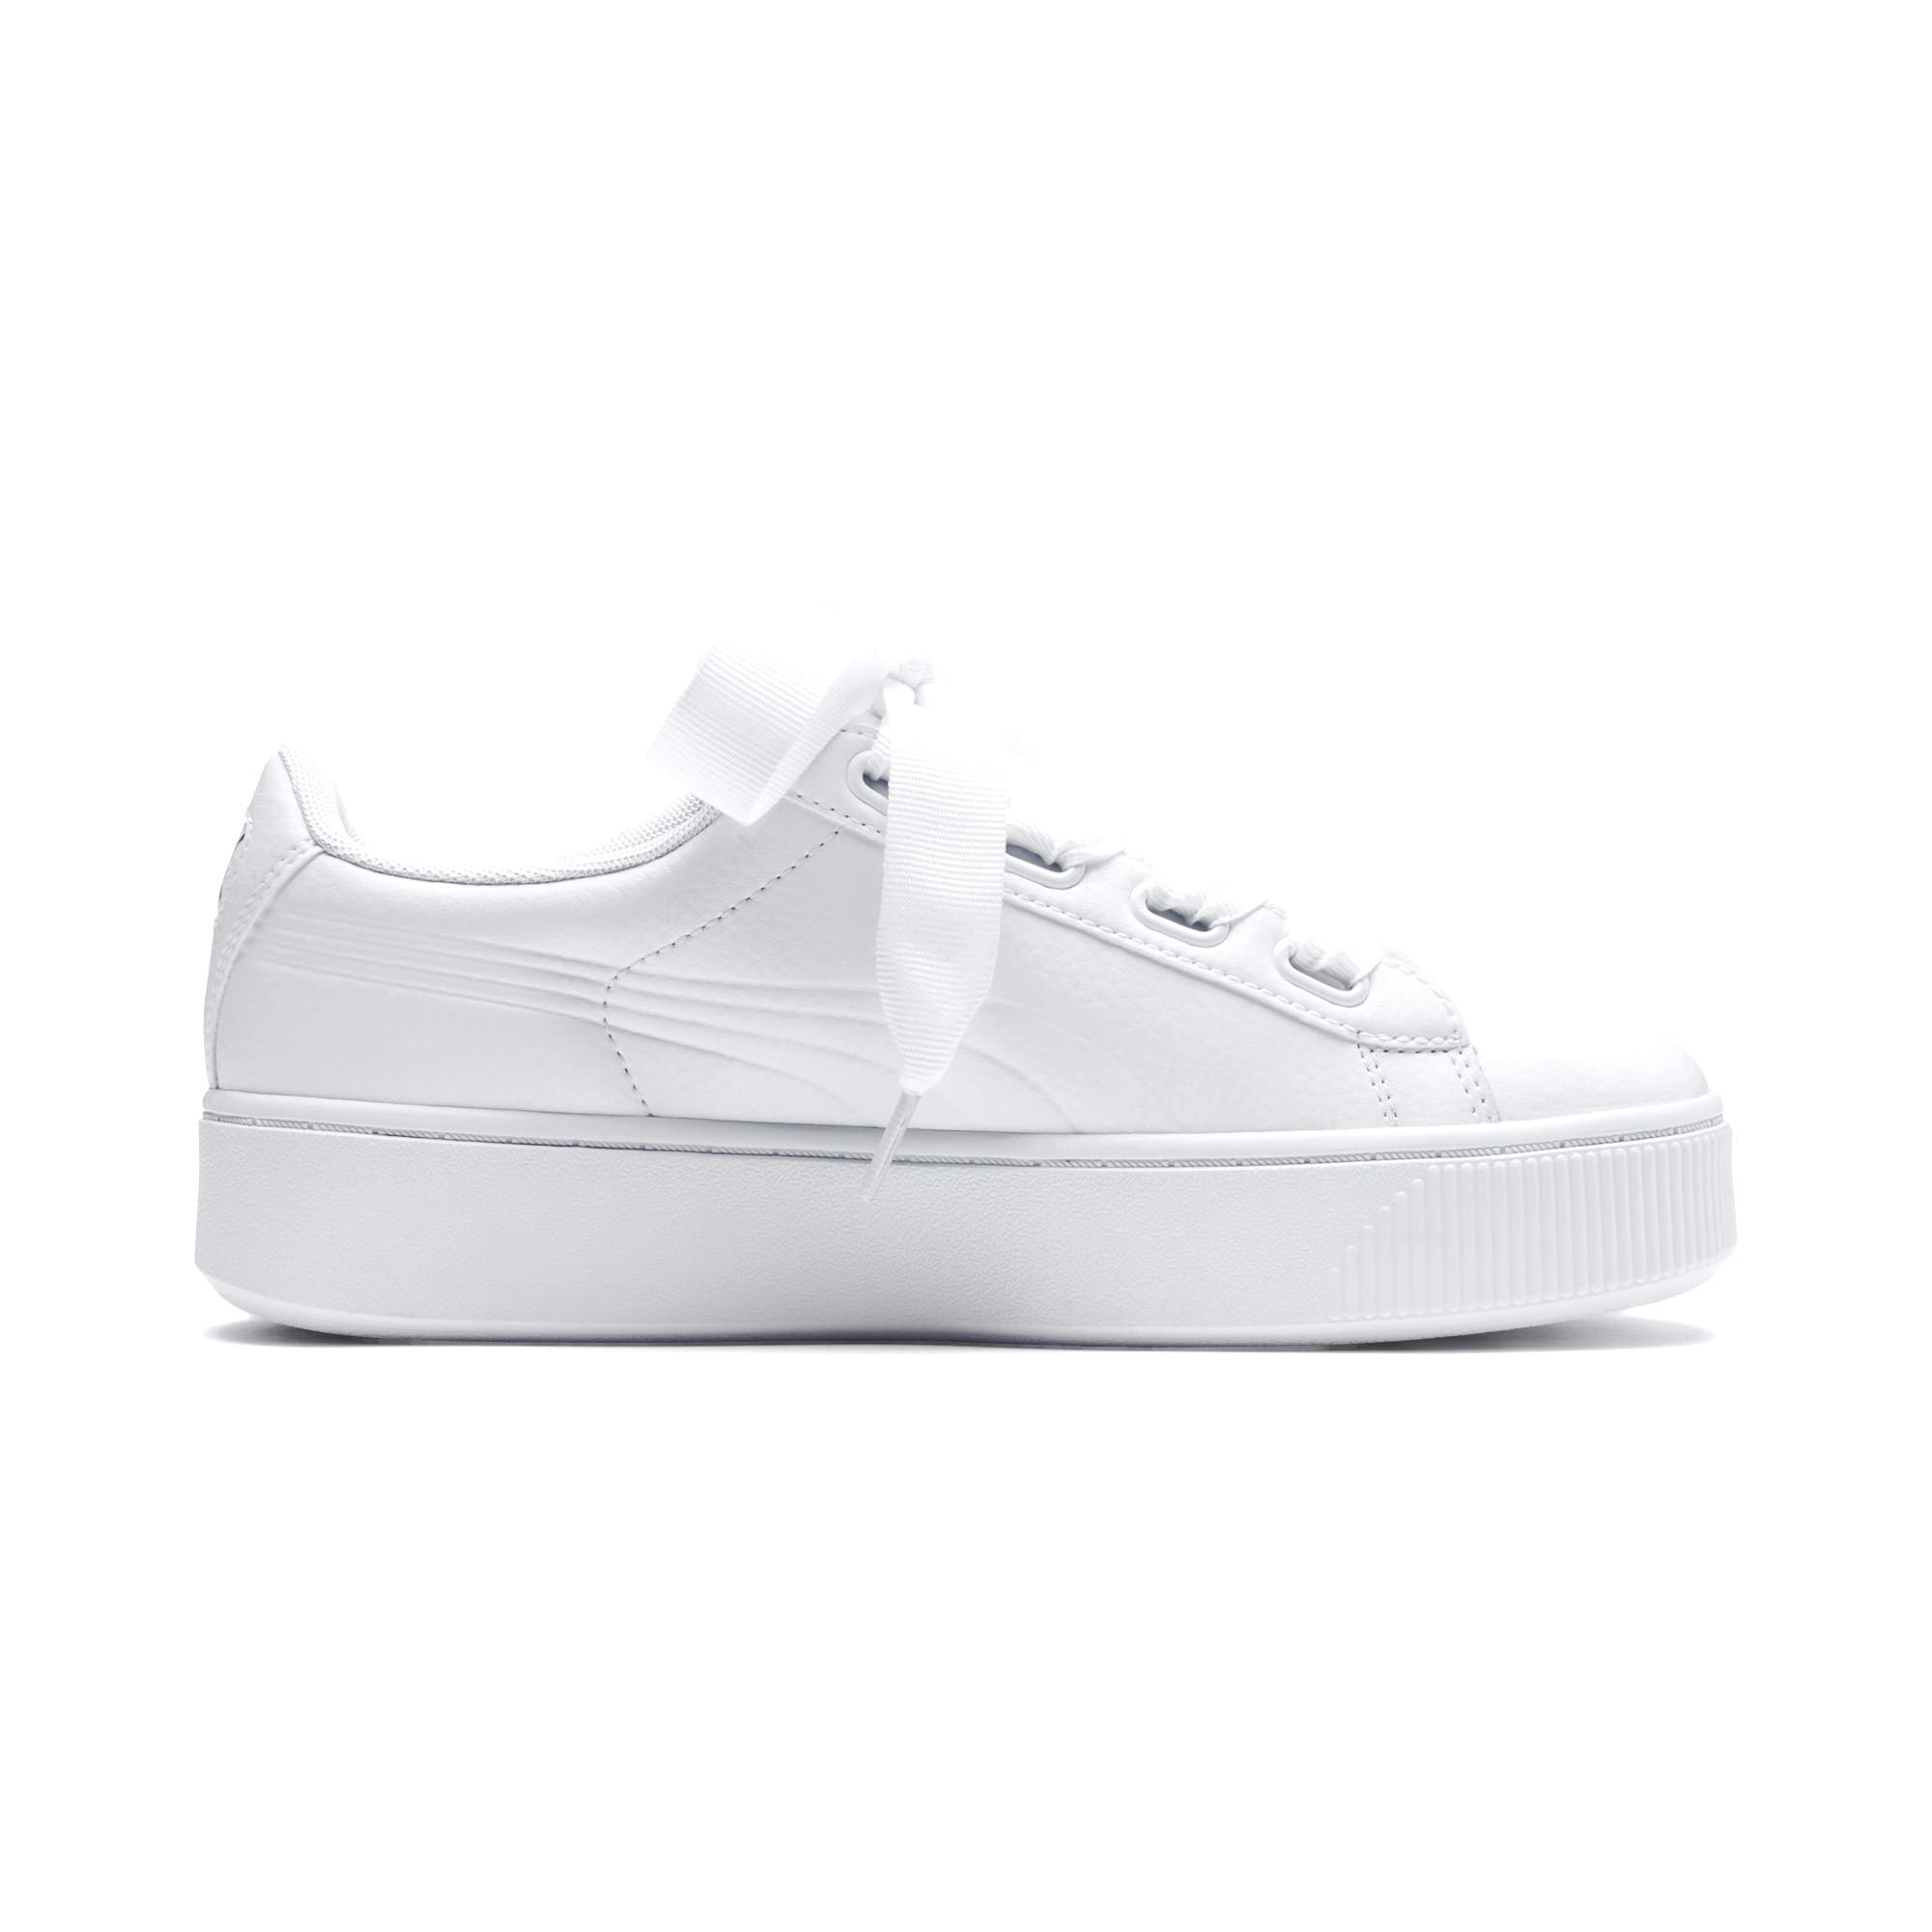 Thumbnail 5 of PUMA Vikky Stacked Ribbon Core Women's Sneakers, Puma White-Puma White, medium